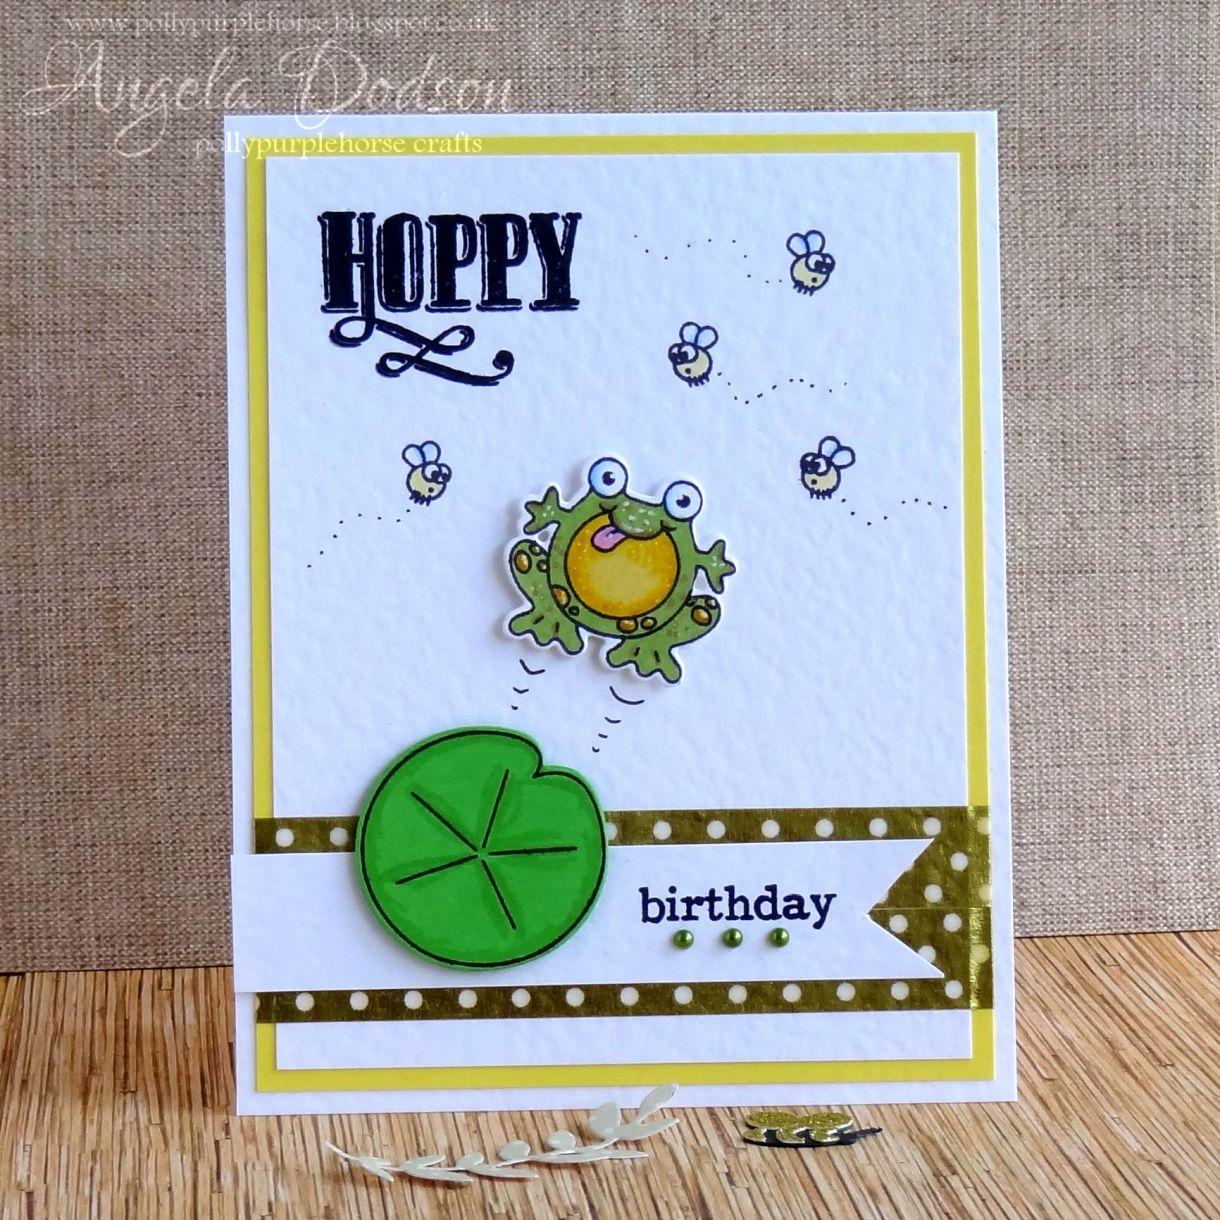 Hoppy birthday card step by step tutorial bookmarktalkfo Images